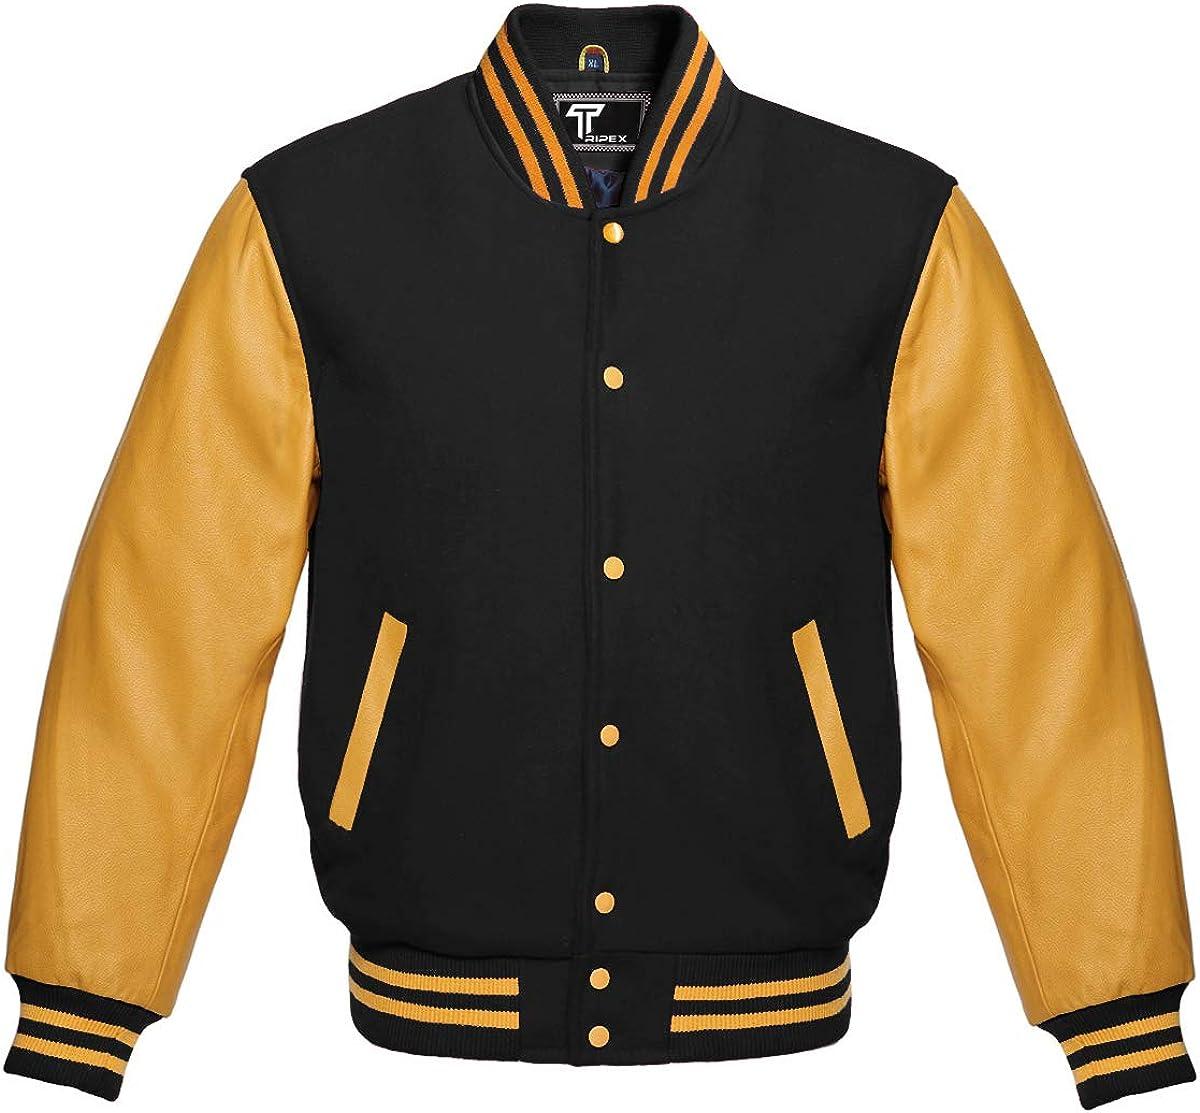 Premium New Letterman Baseball College School Varsity Jacket Wool Real Leather